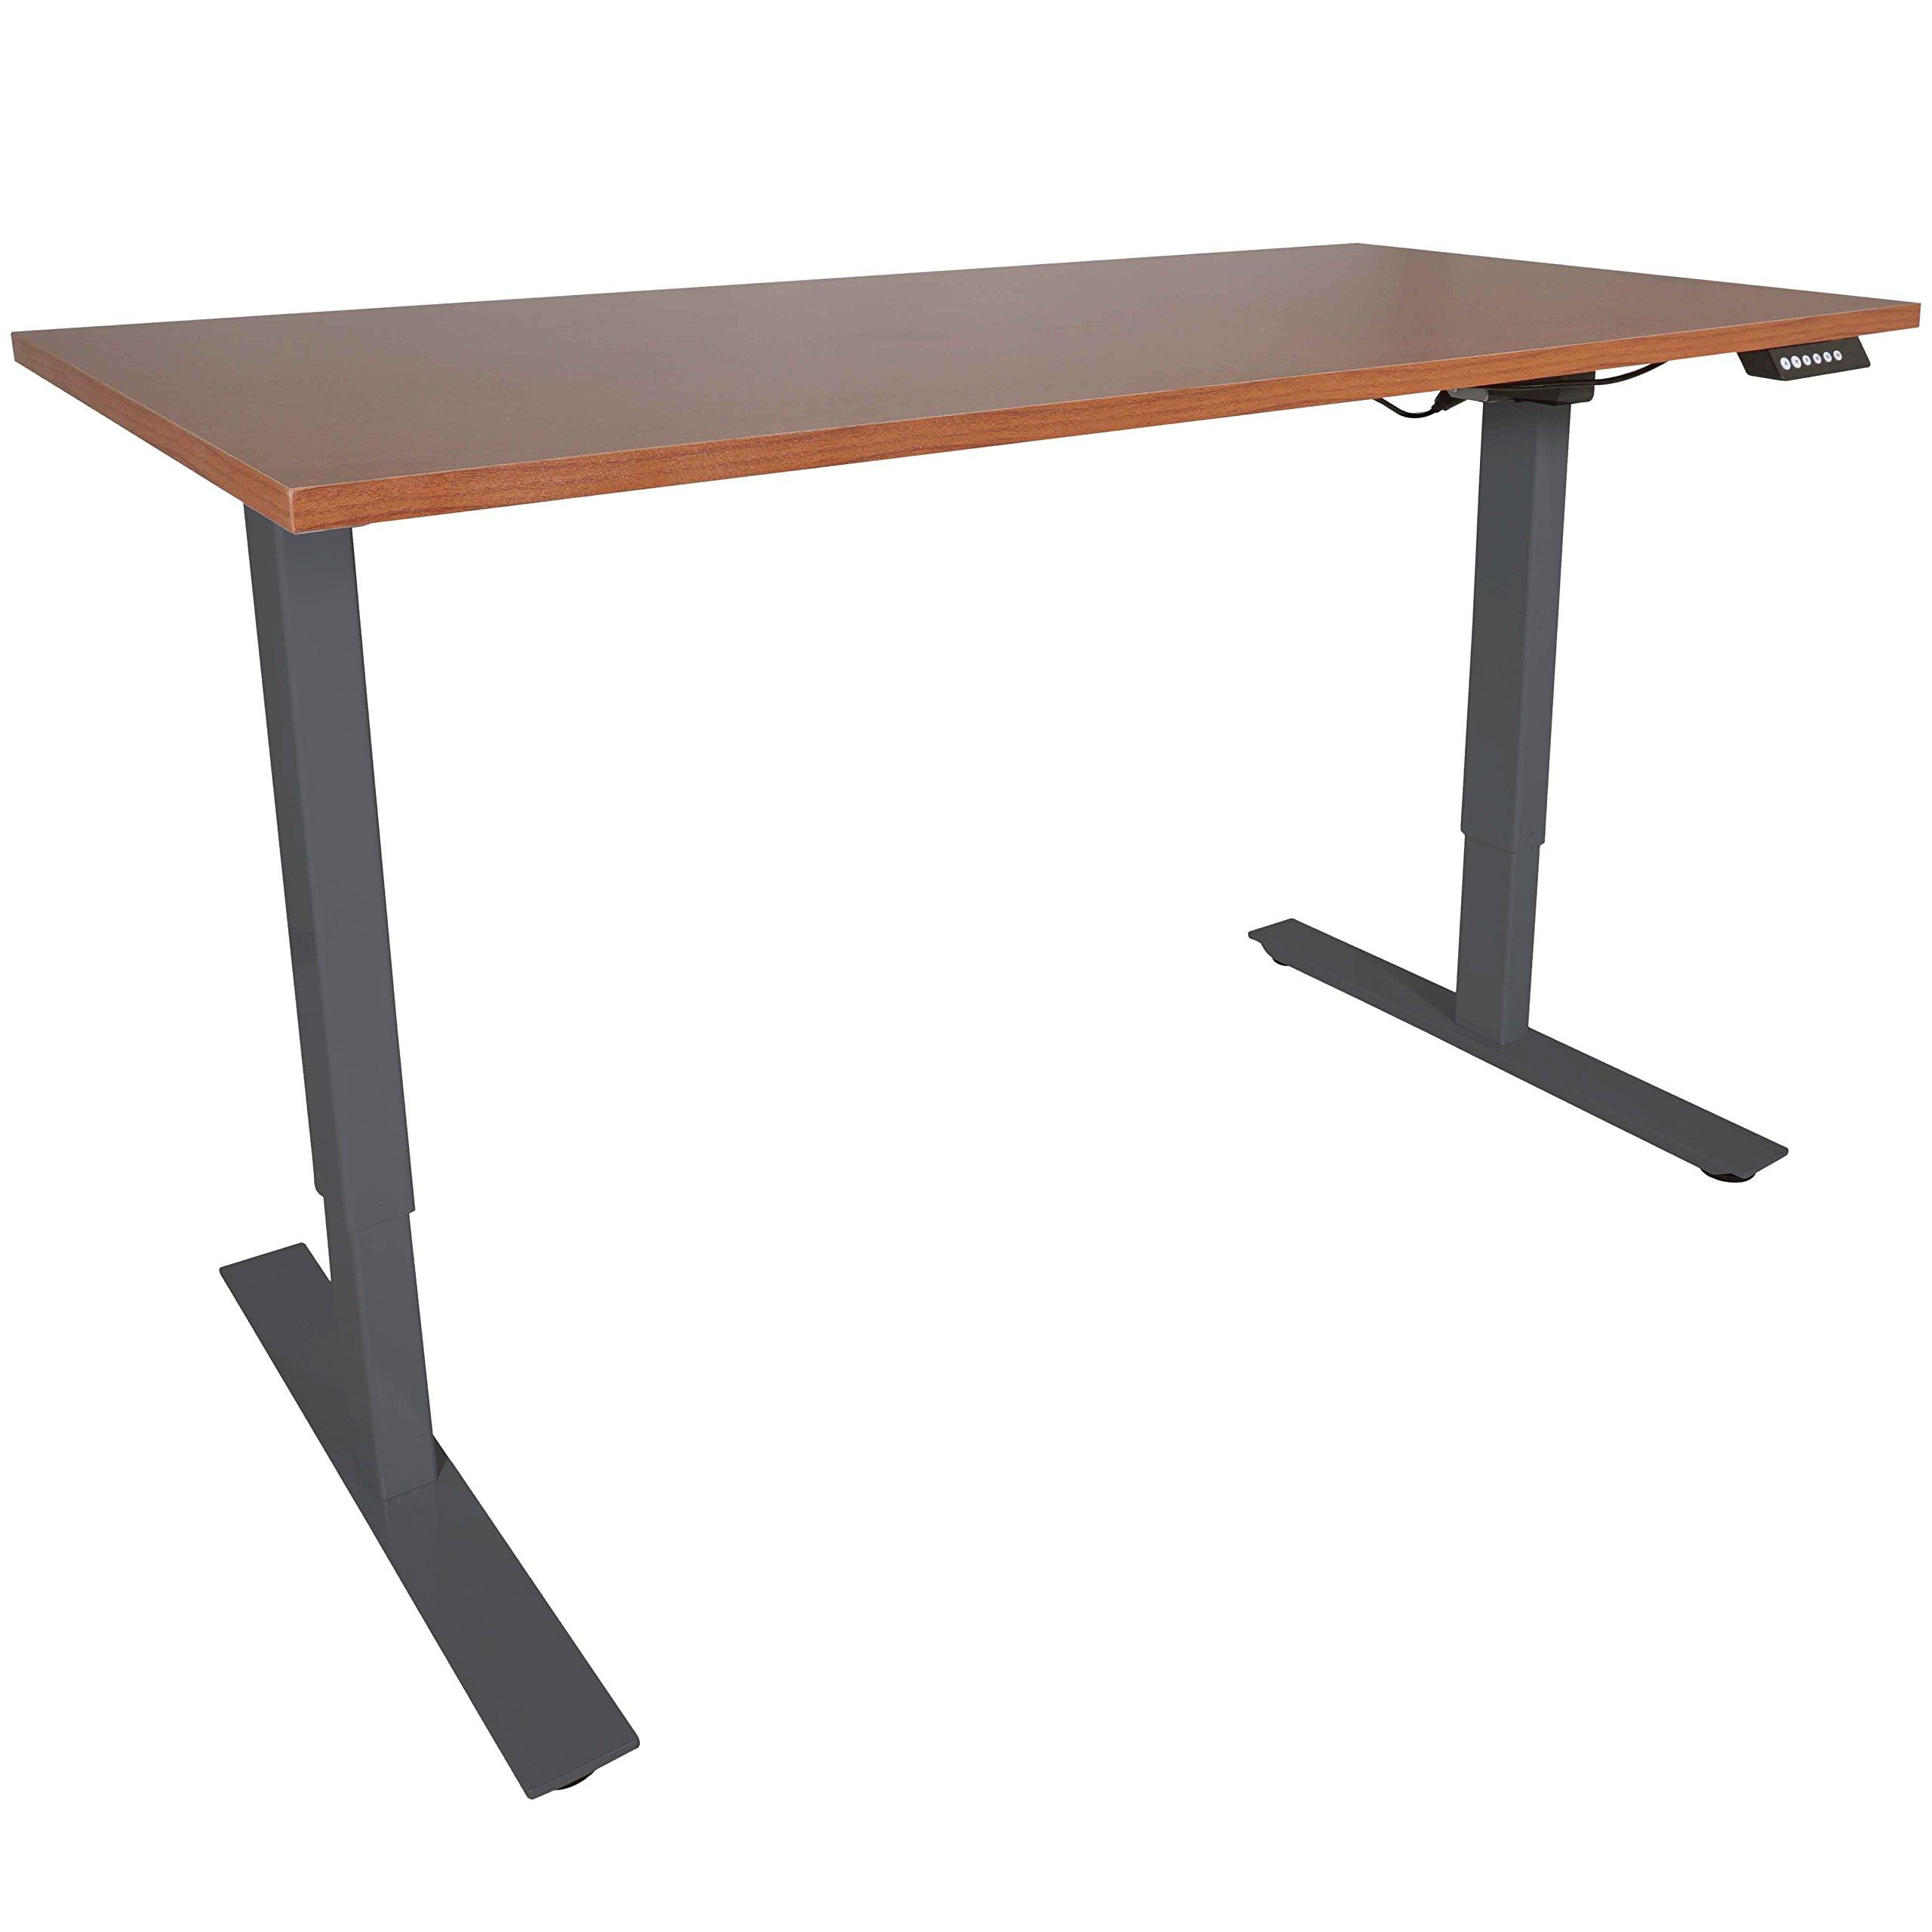 TITAN FITNESS A2 Single Motor Sit/Stand Desk w/Wood 30''x60'' Top Conversion